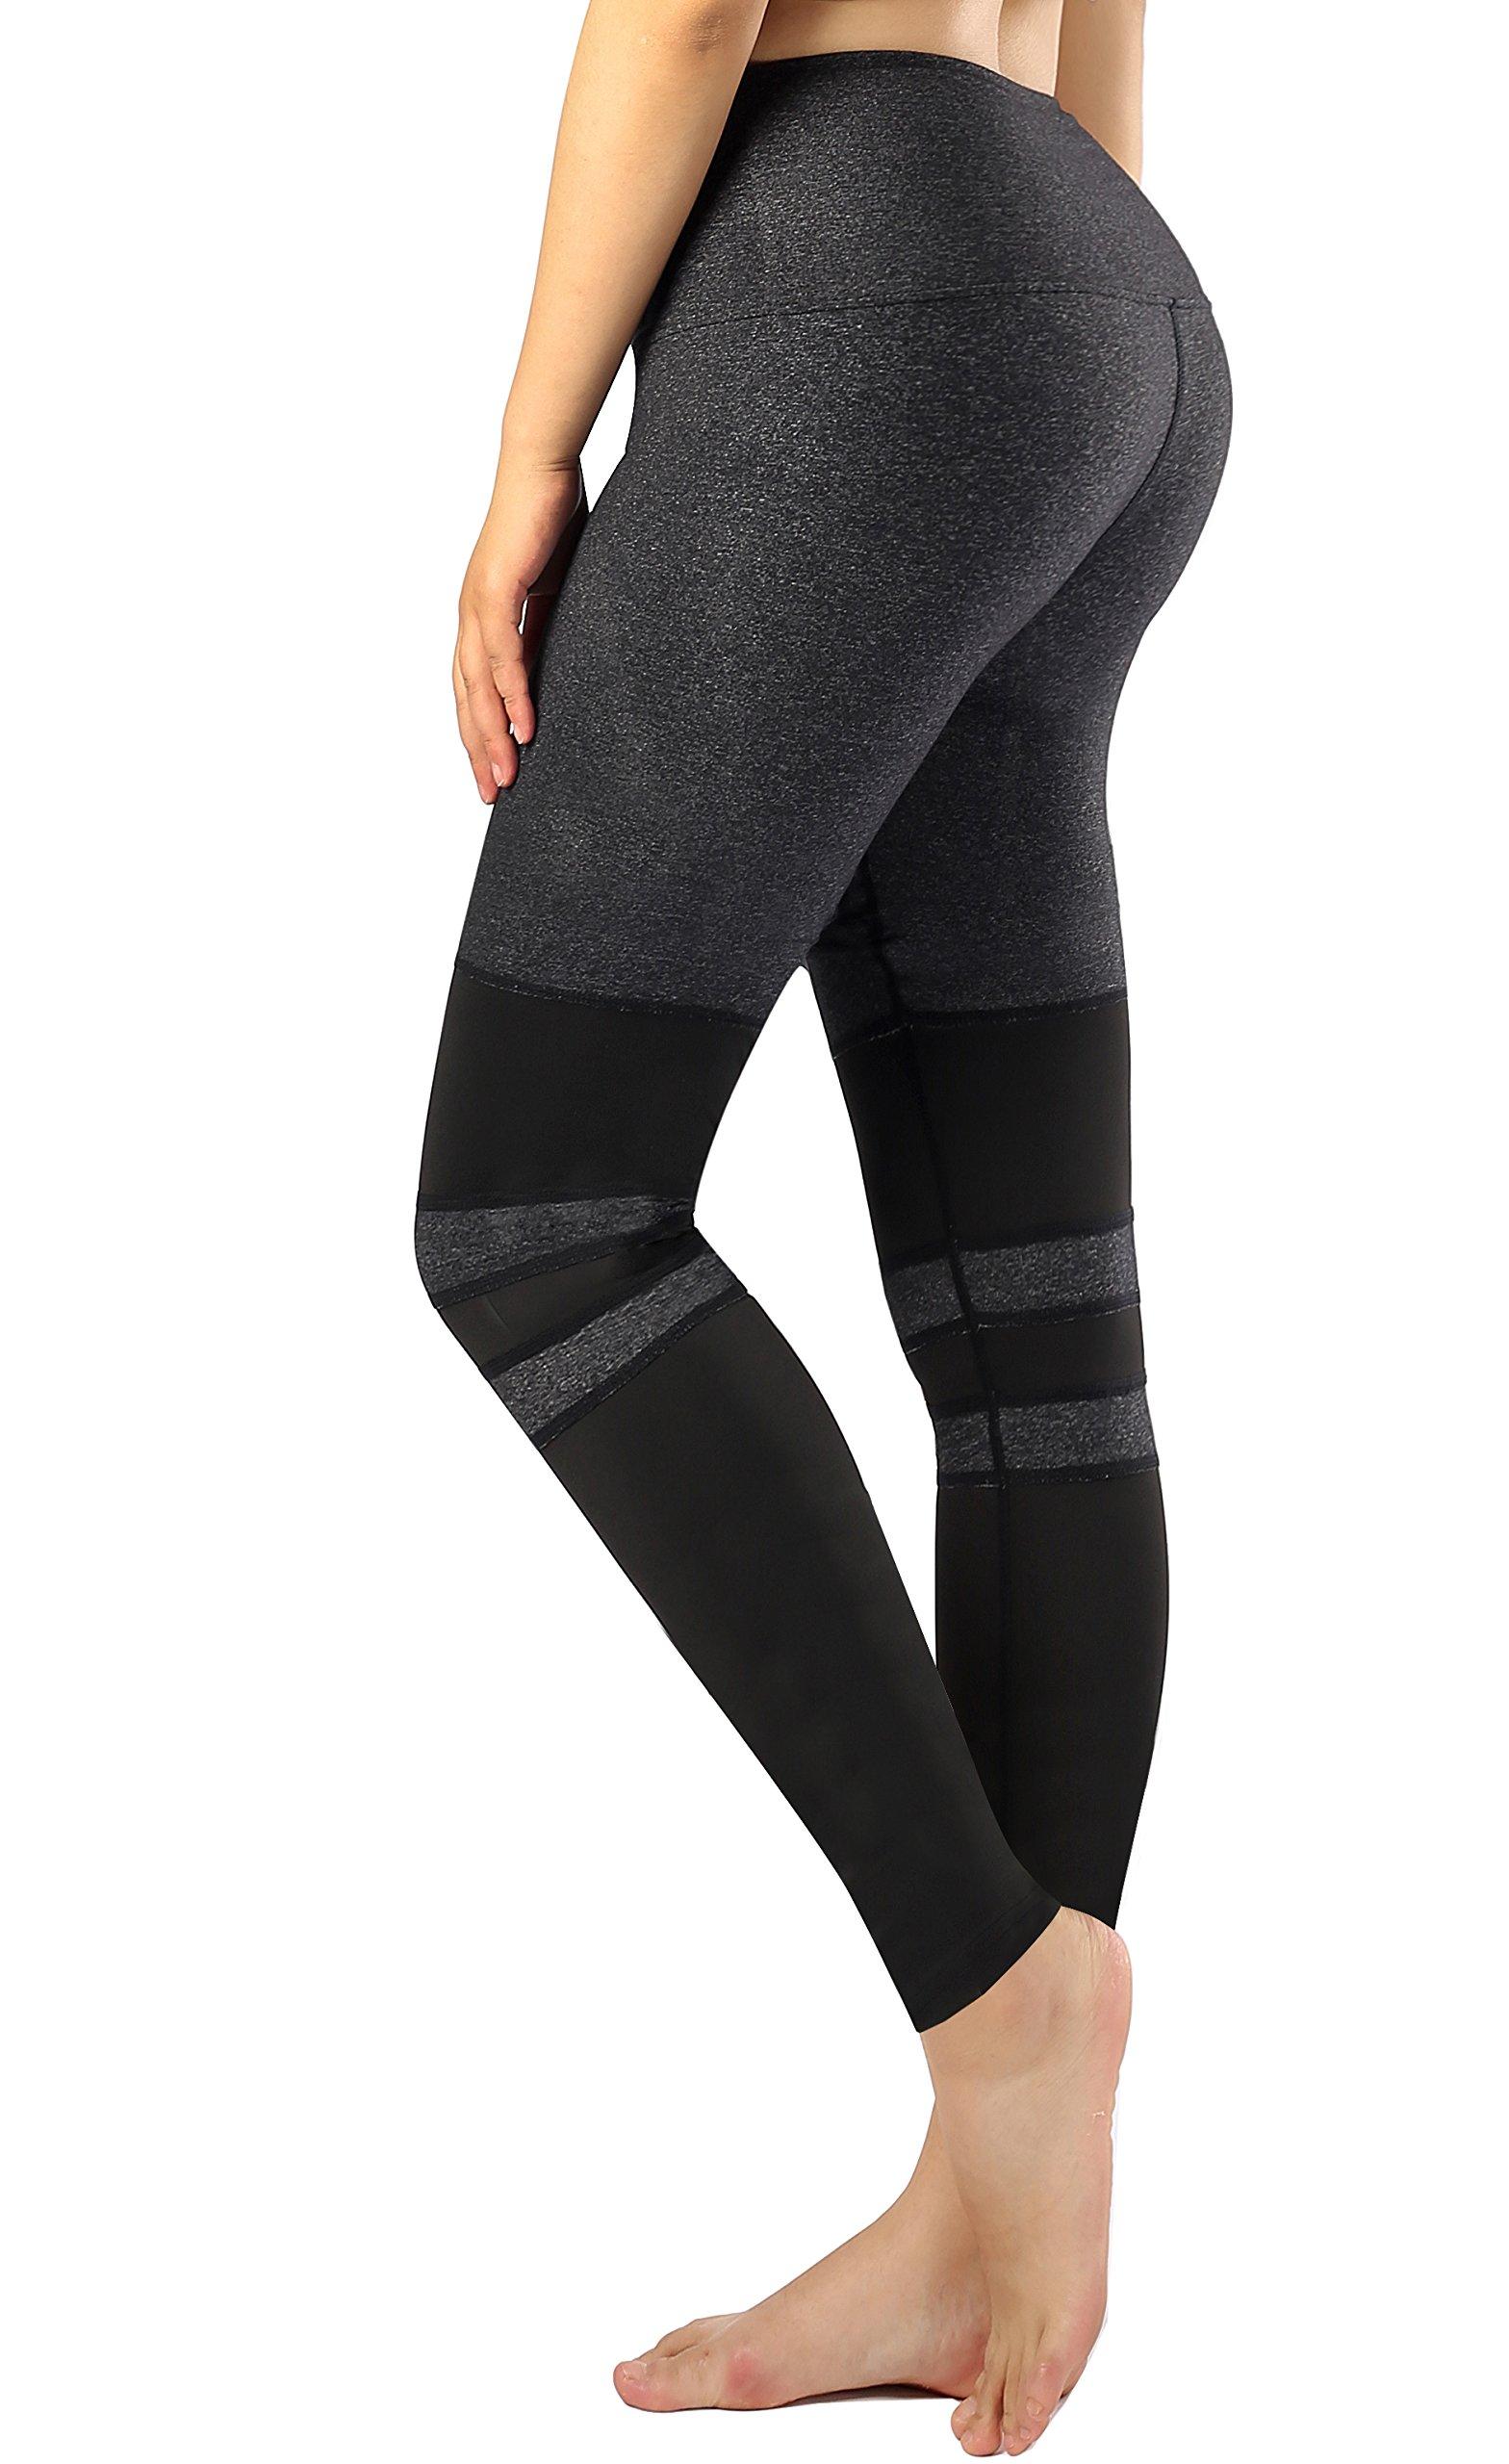 Sugar Pocket Women's Ankle Tights Running Pants Exercise Leggings Side Pocket L(Grey/Black)